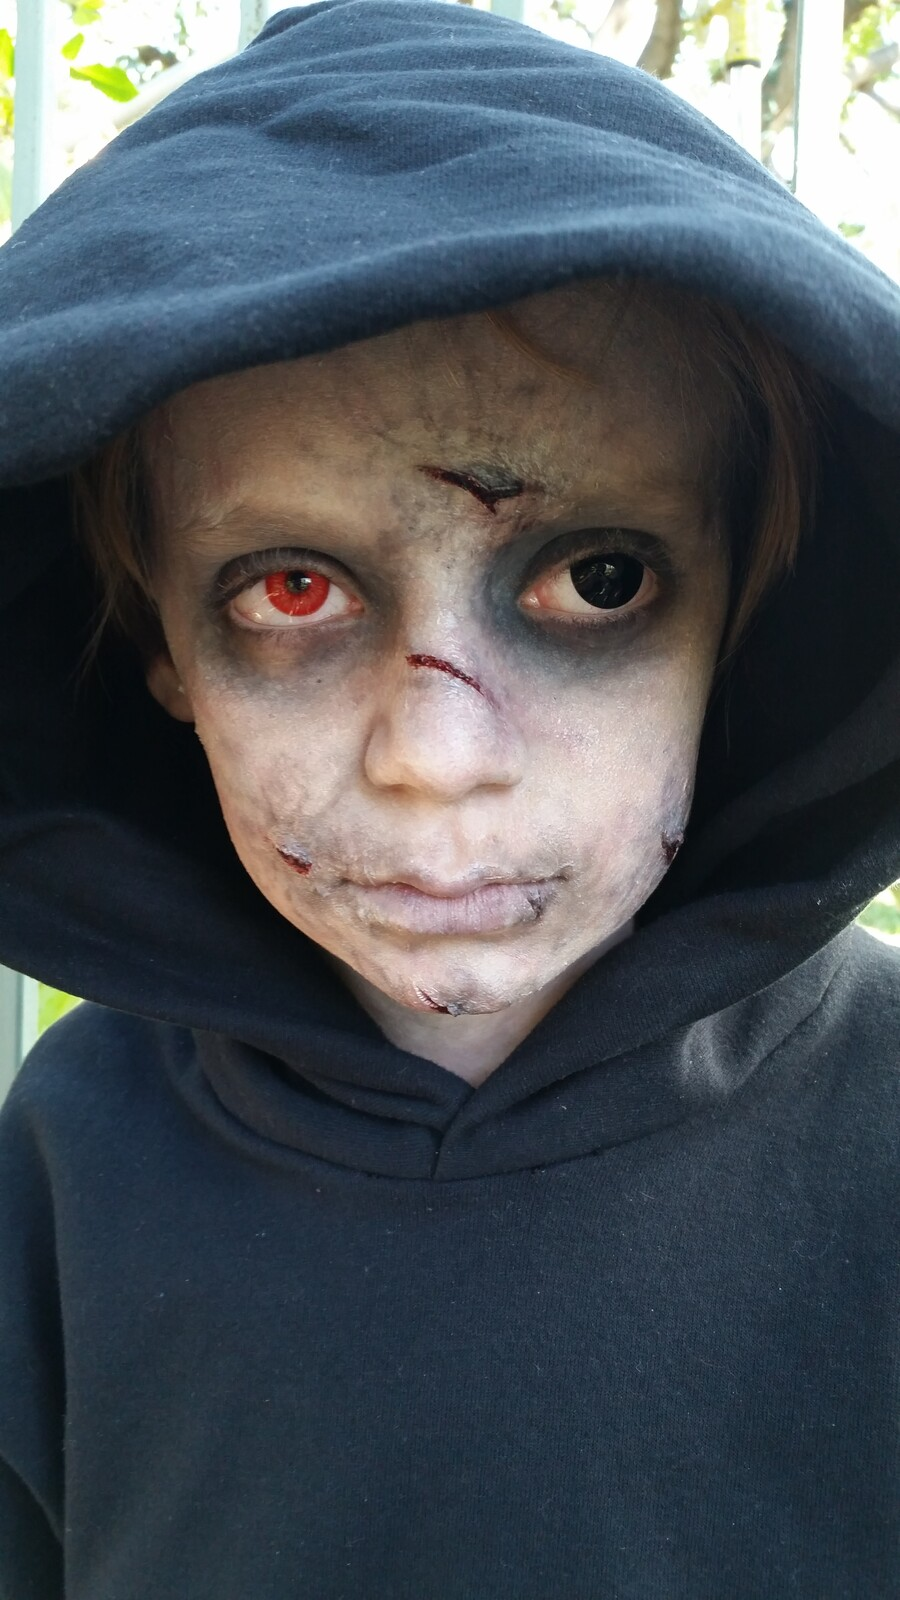 Possessed Child Make-up